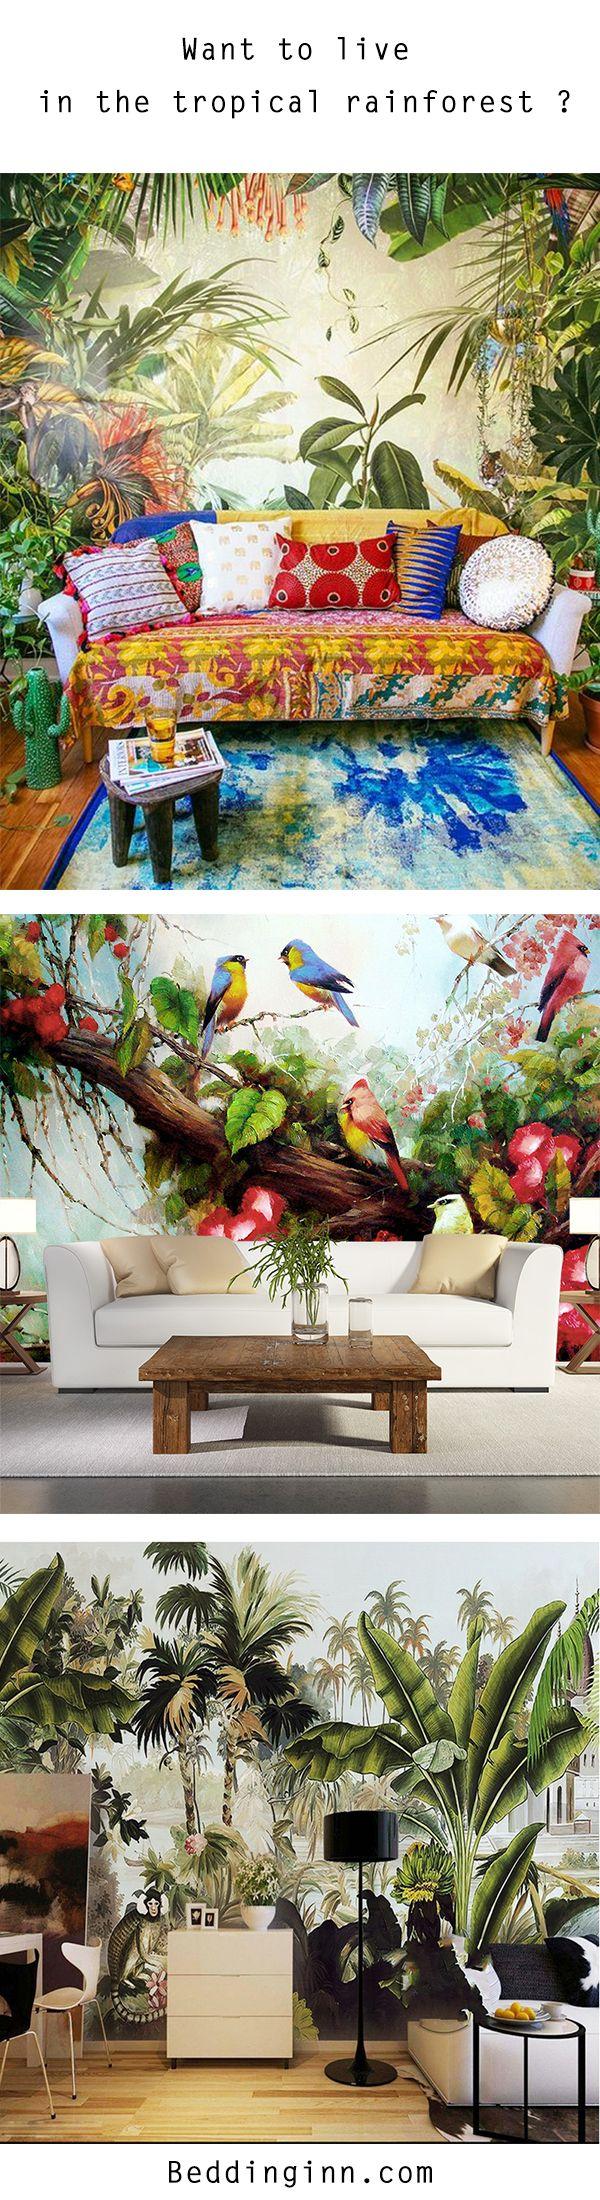 46 best 3d wall murals images on pinterest 3d wall murals 3d recommend wall murals large wall murals art wallpaper for bedroom living room